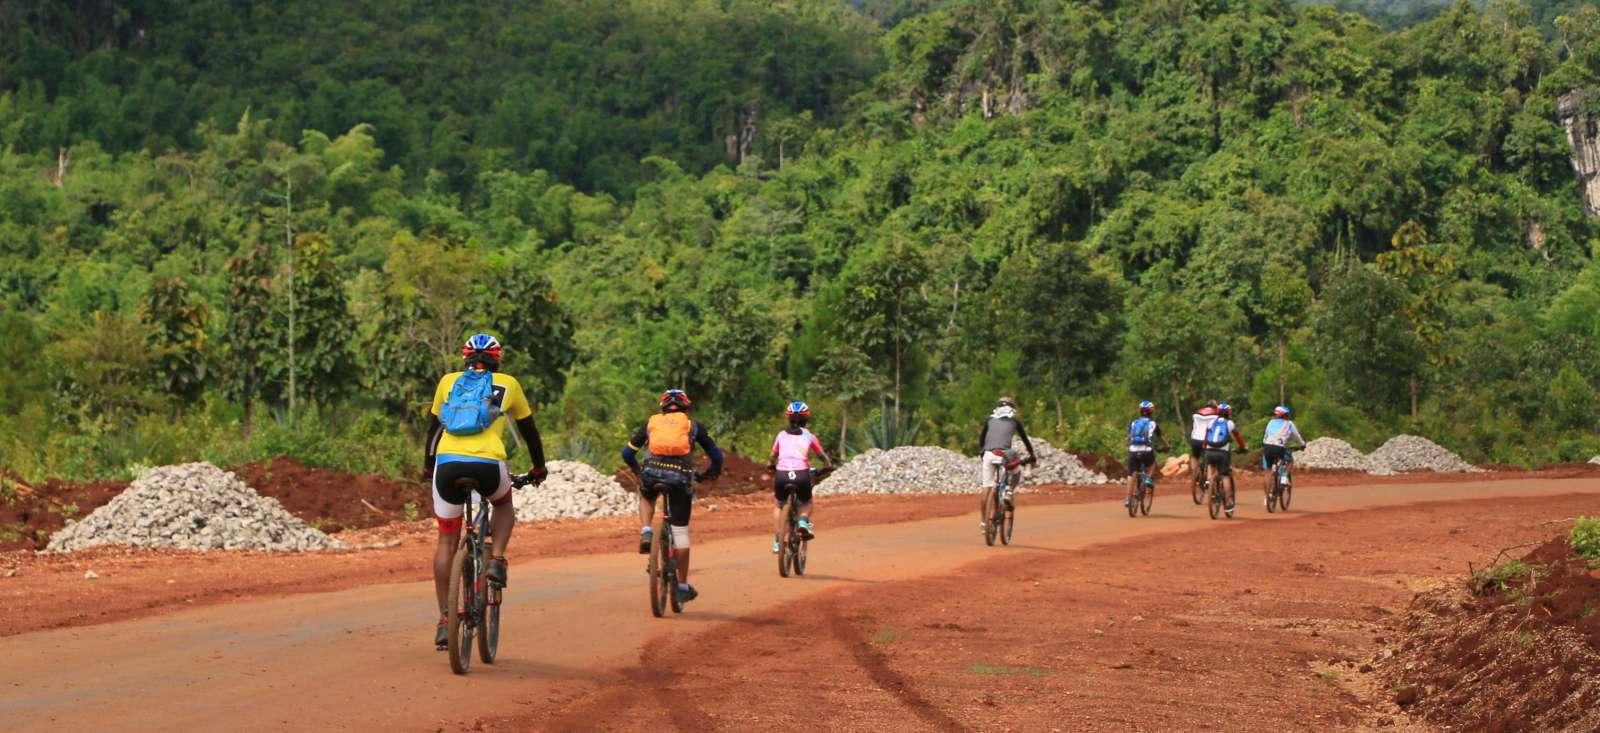 Voyage en véhicule : A VTT sur les sentiers birmans !